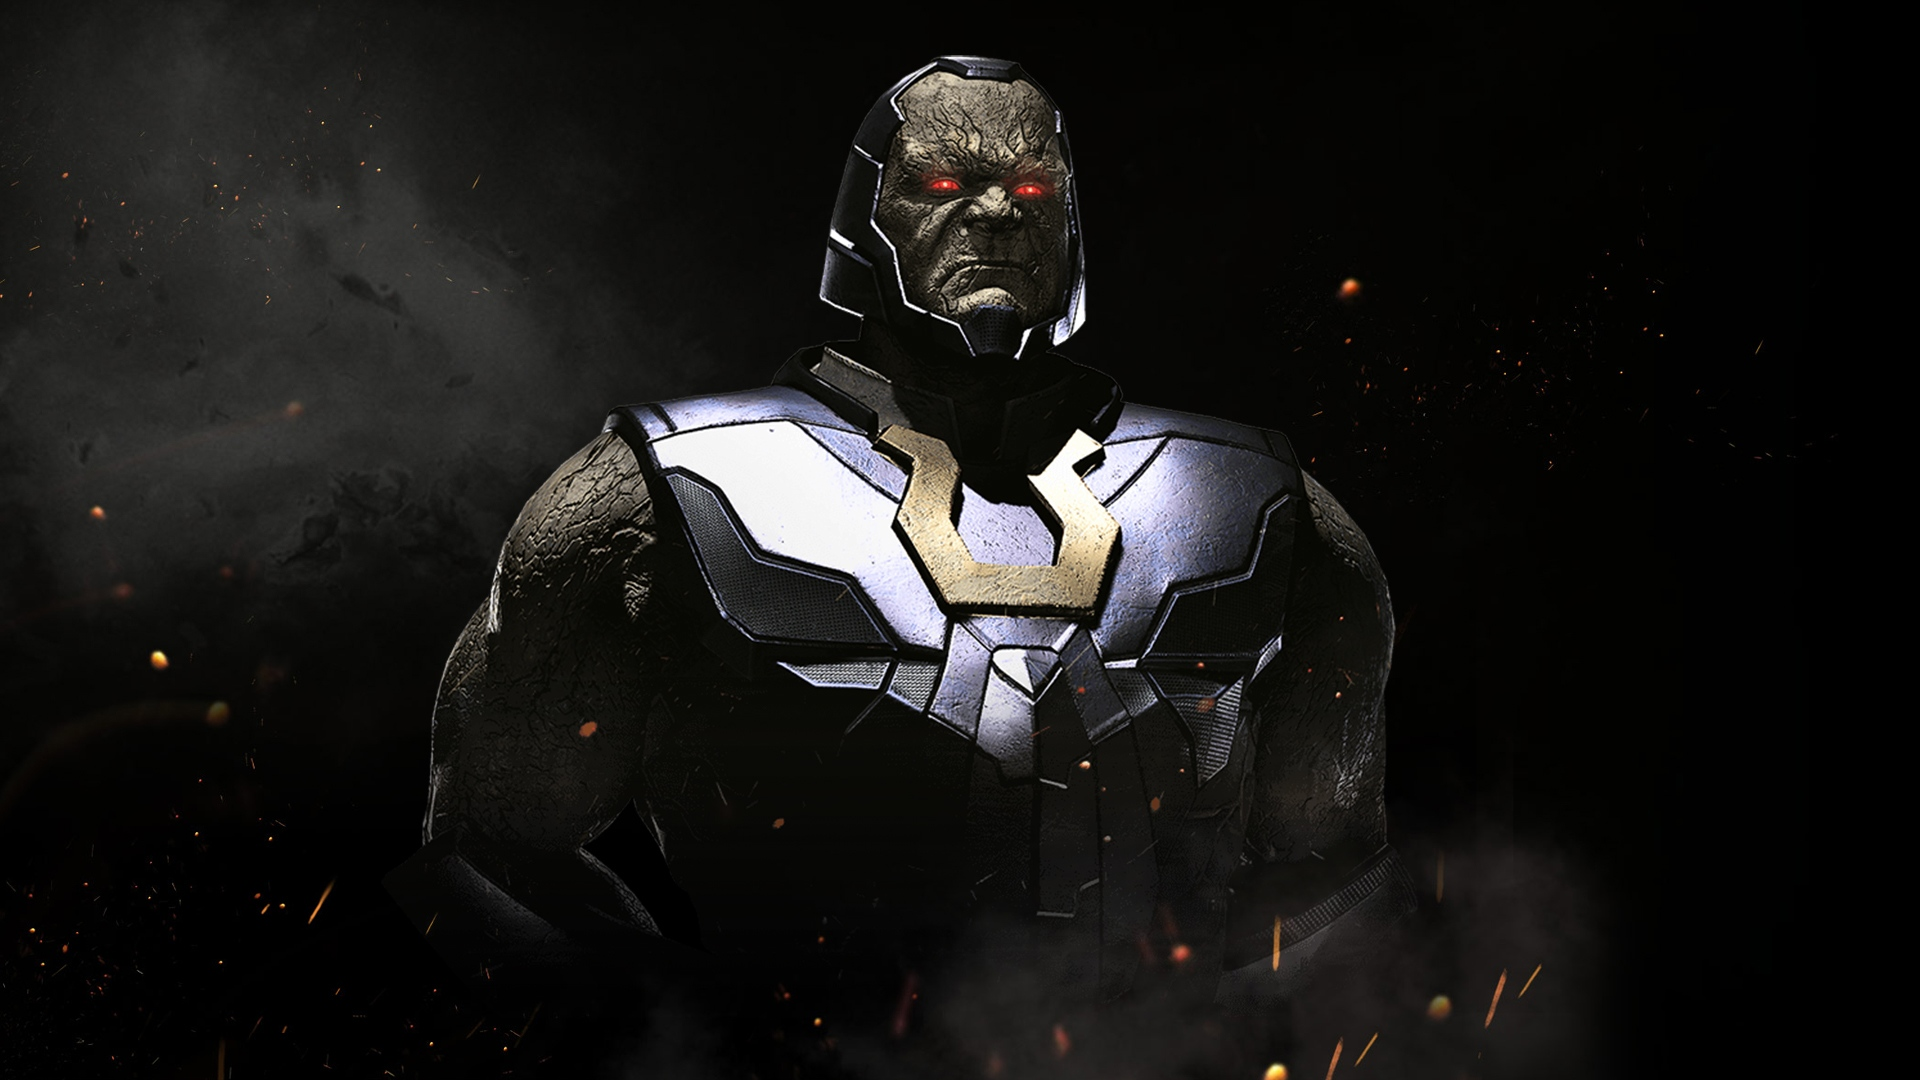 Injustice 2 darkseid ps4wallpapers download wallpaper voltagebd Image collections